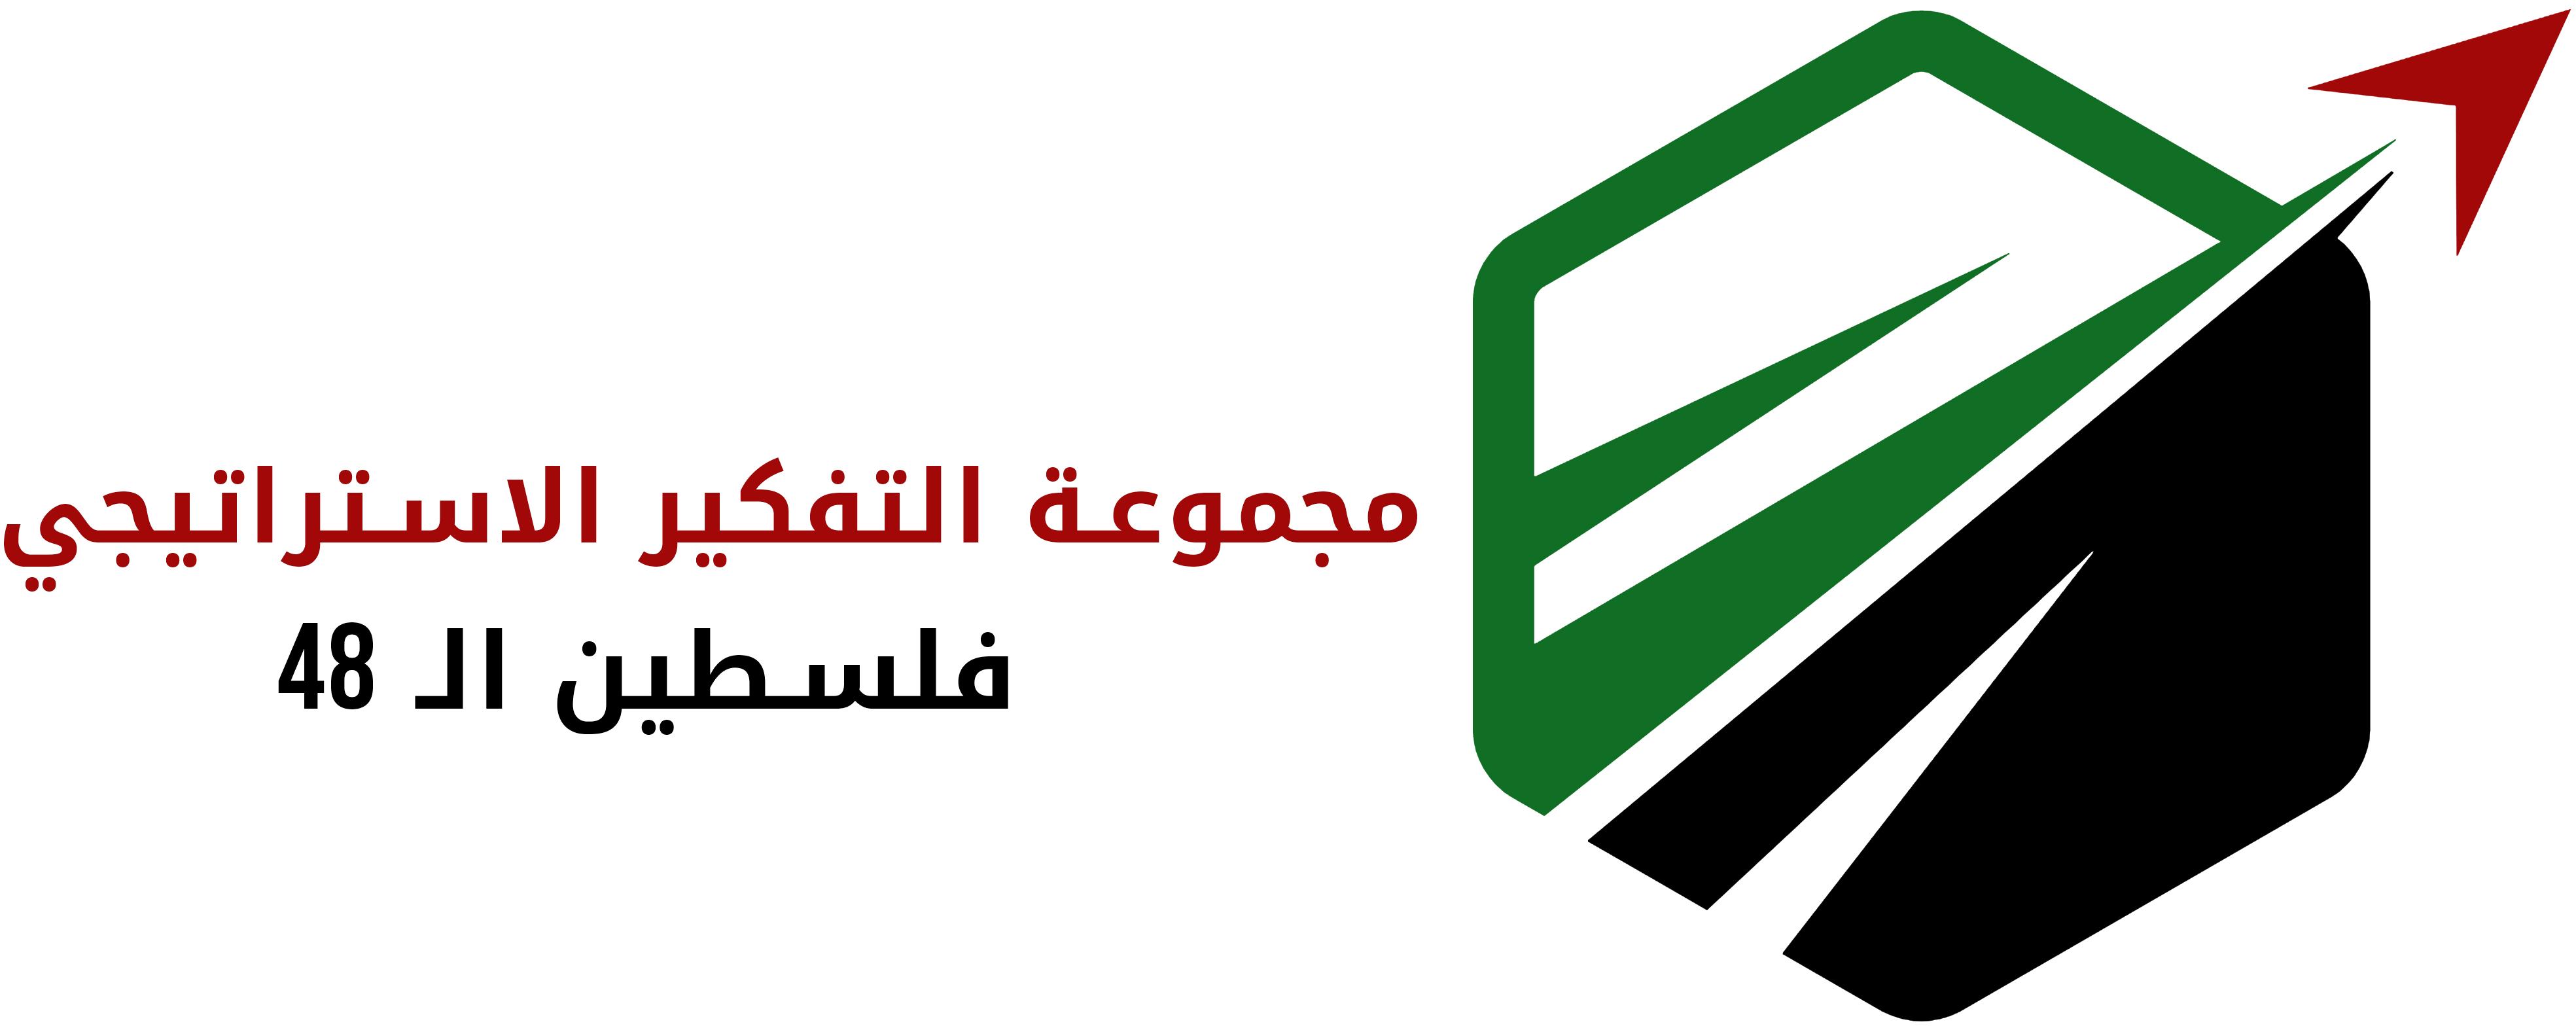 tafkir logo